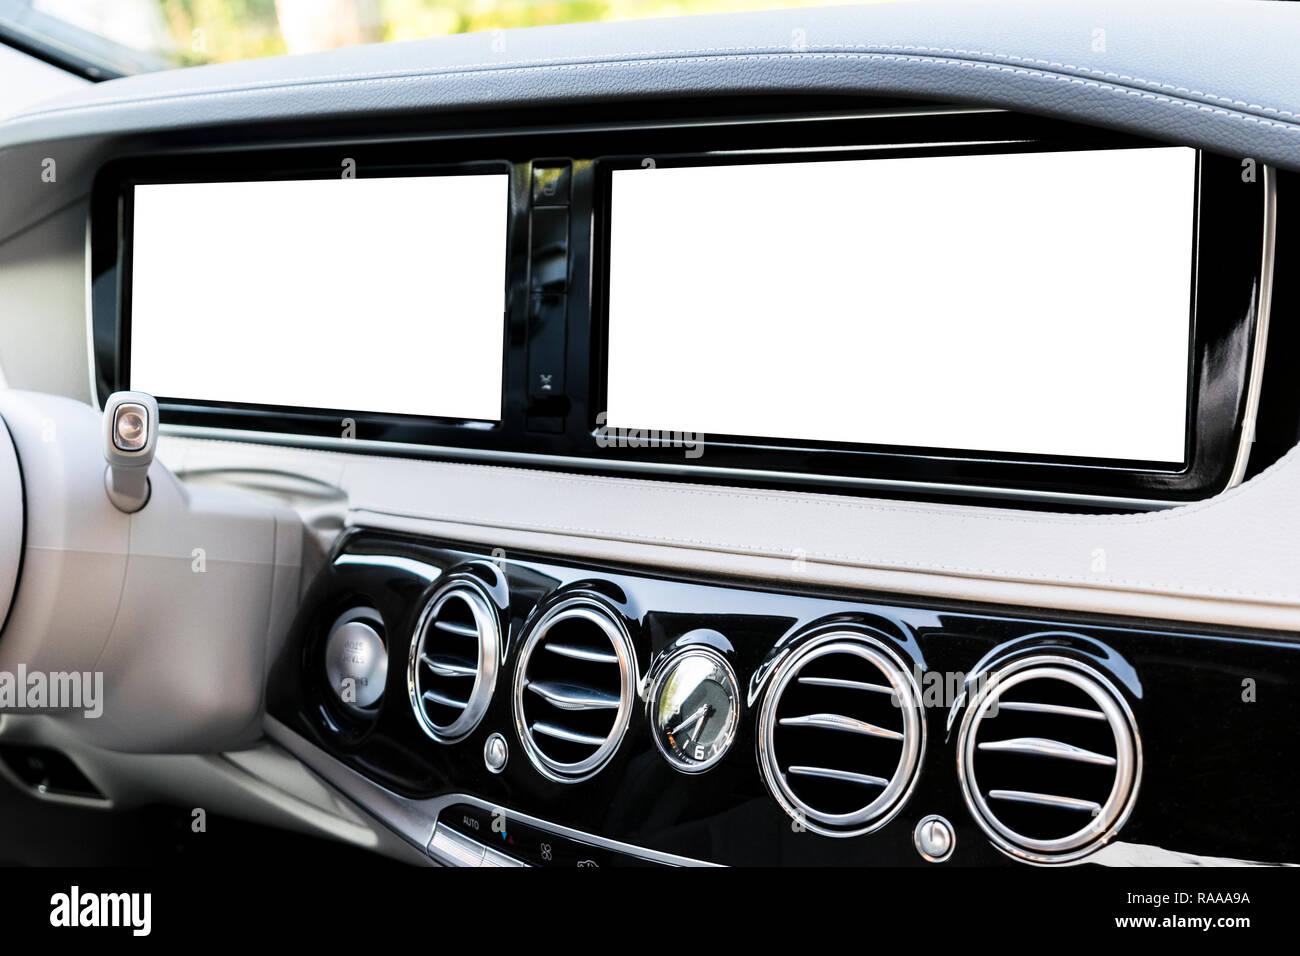 Automotive Technology Stock Photos & Automotive Technology Stock